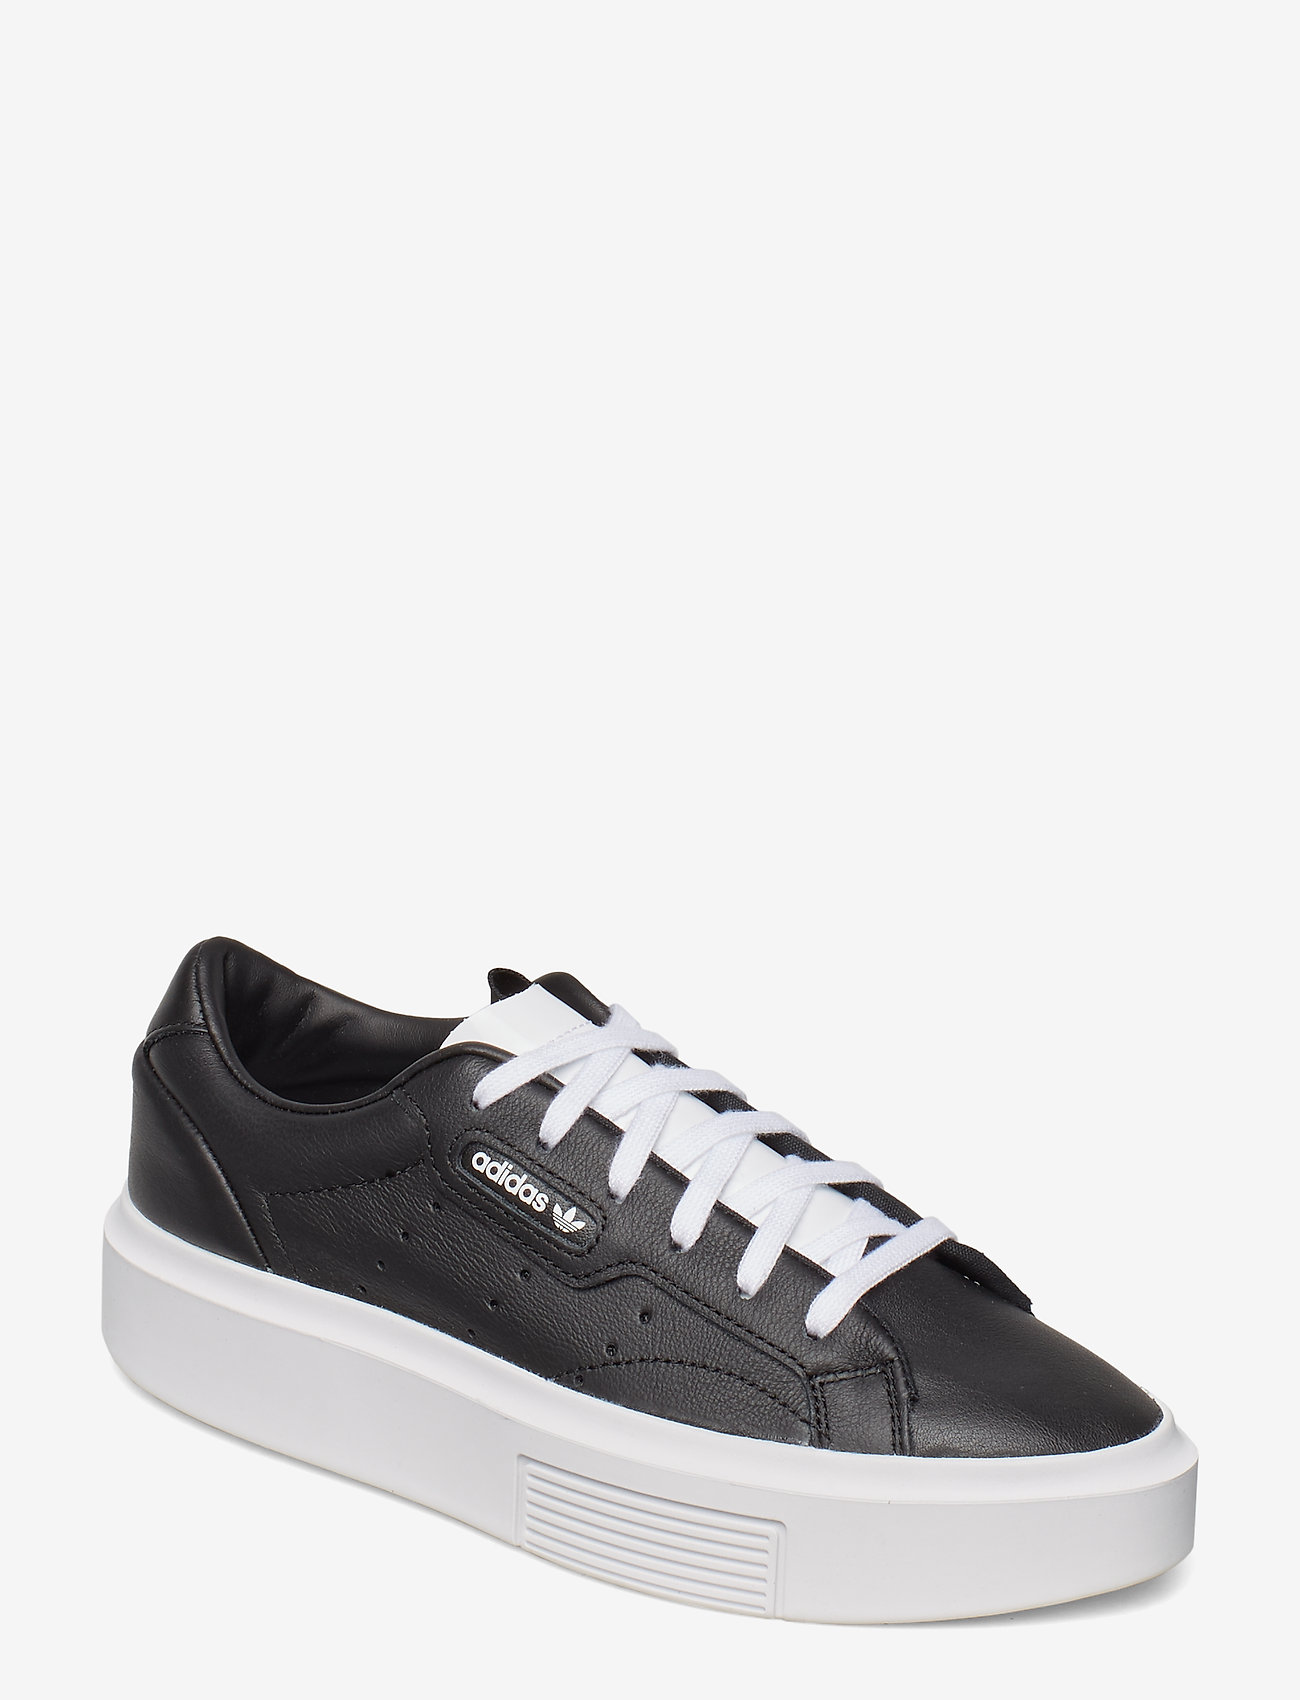 adidas Originals adidas SLEEK SUPER W - Sneaker CBLACK/CBLACK/FTWWHT - Schuhe Billige